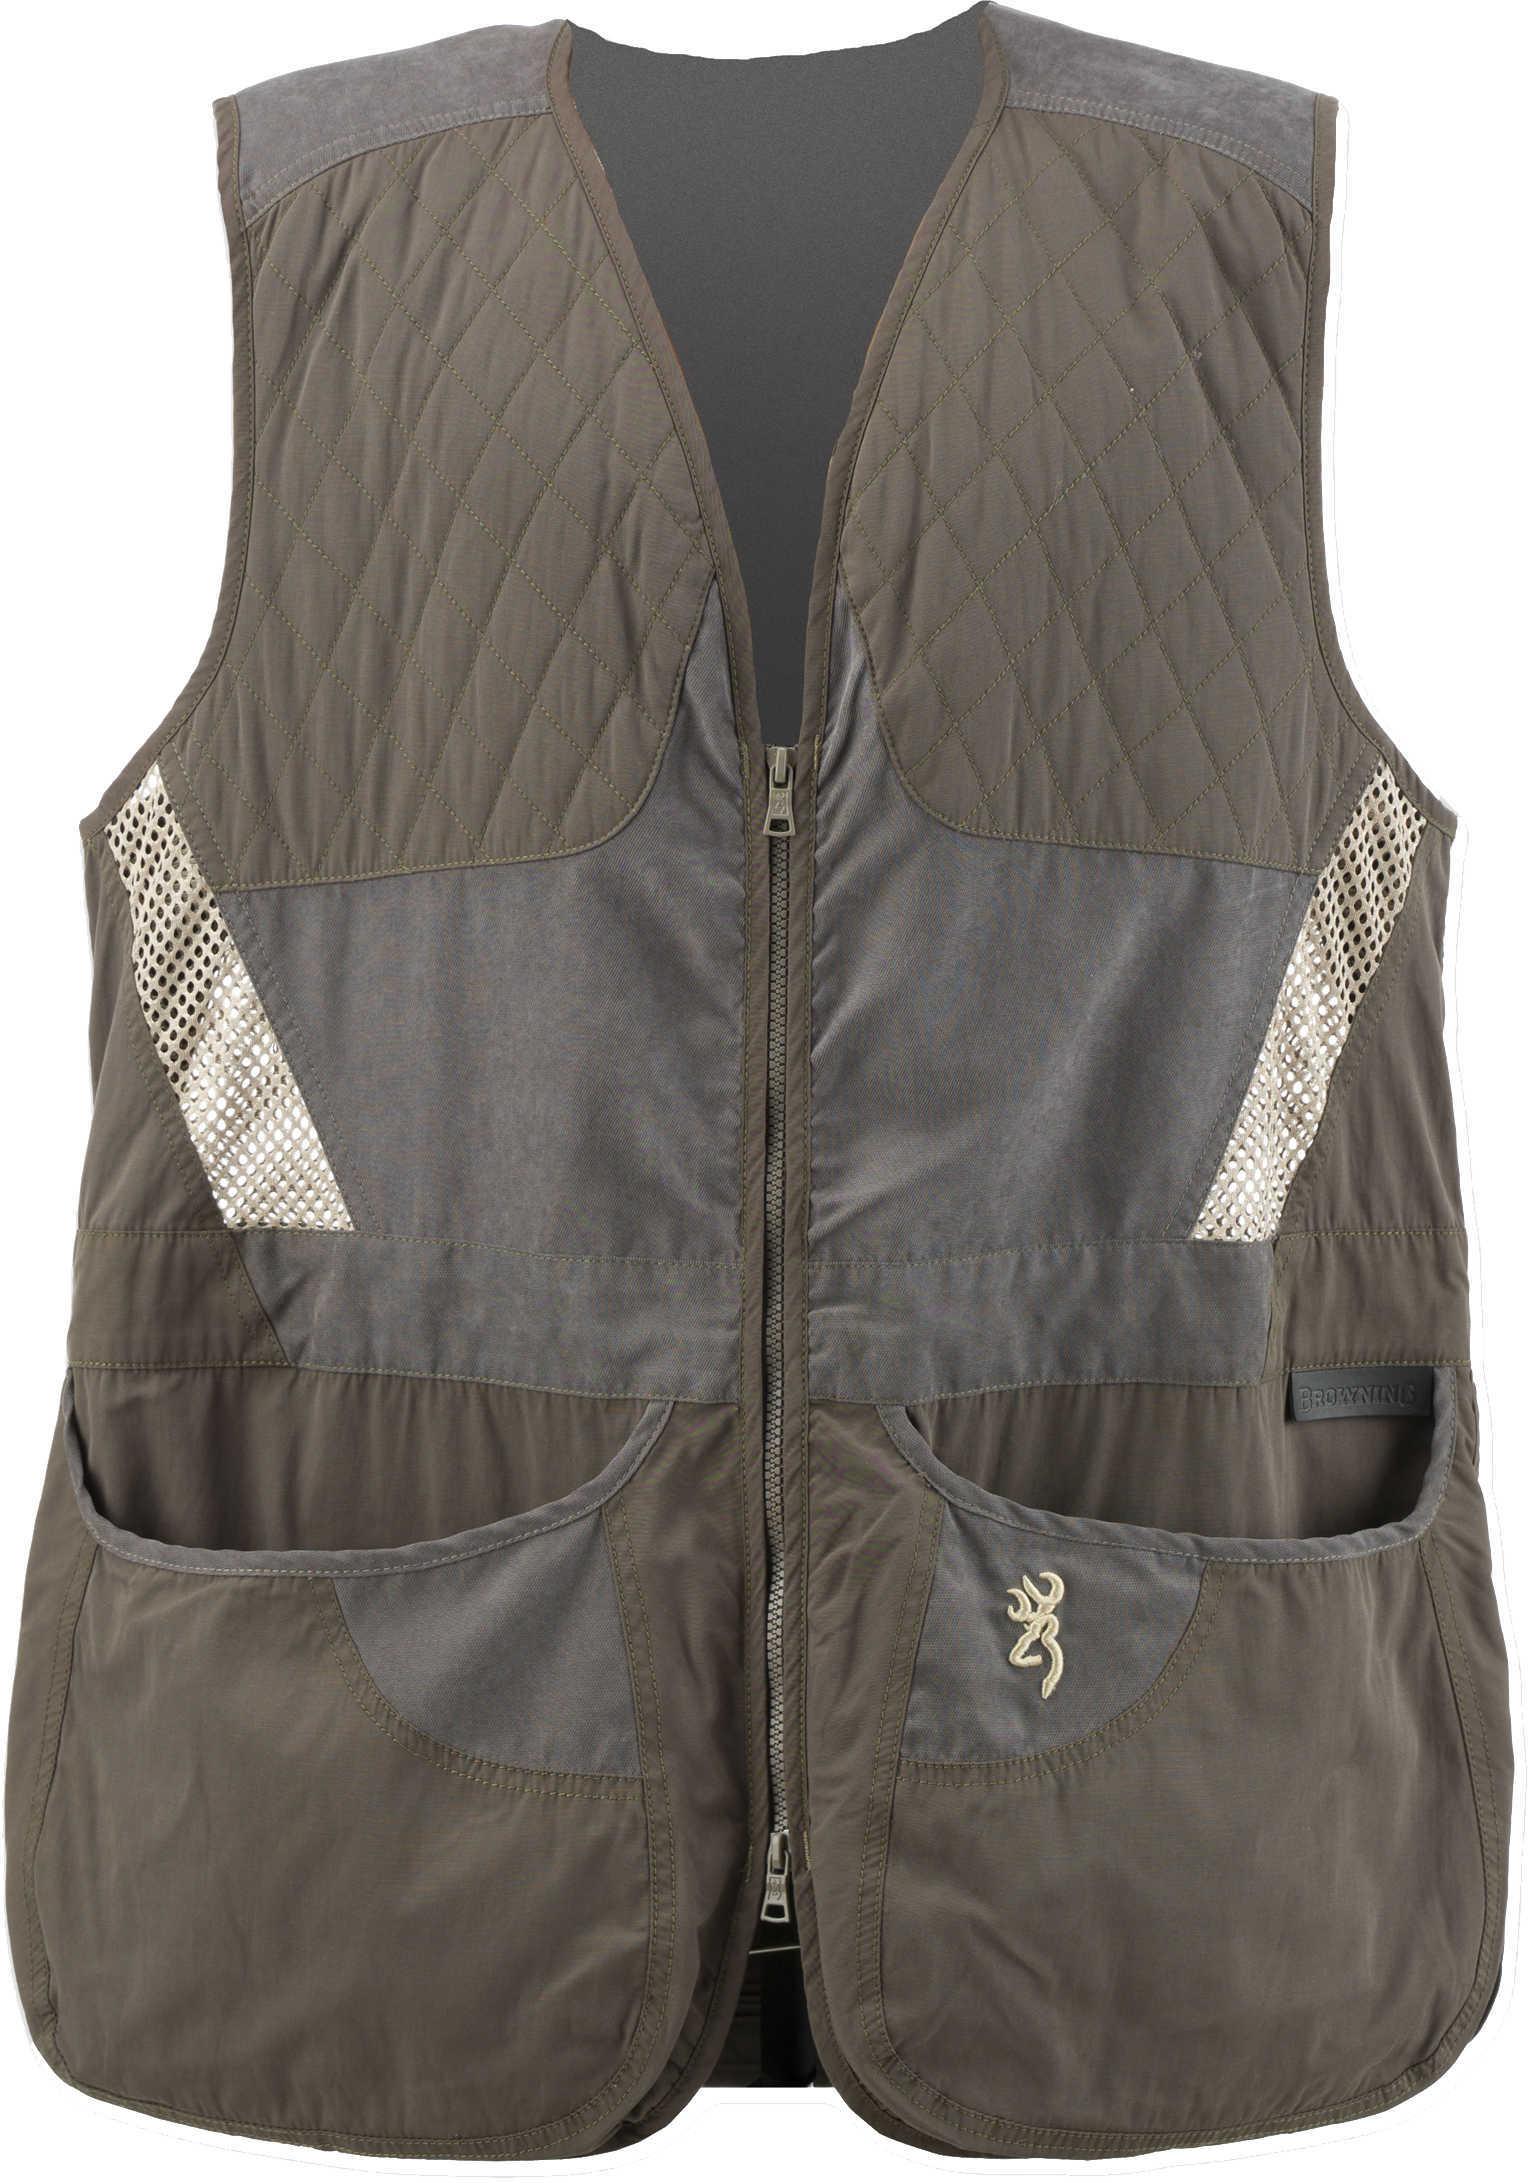 Browning Mens Summit Vest, Green/Dark Grey Large Md: 3050318403